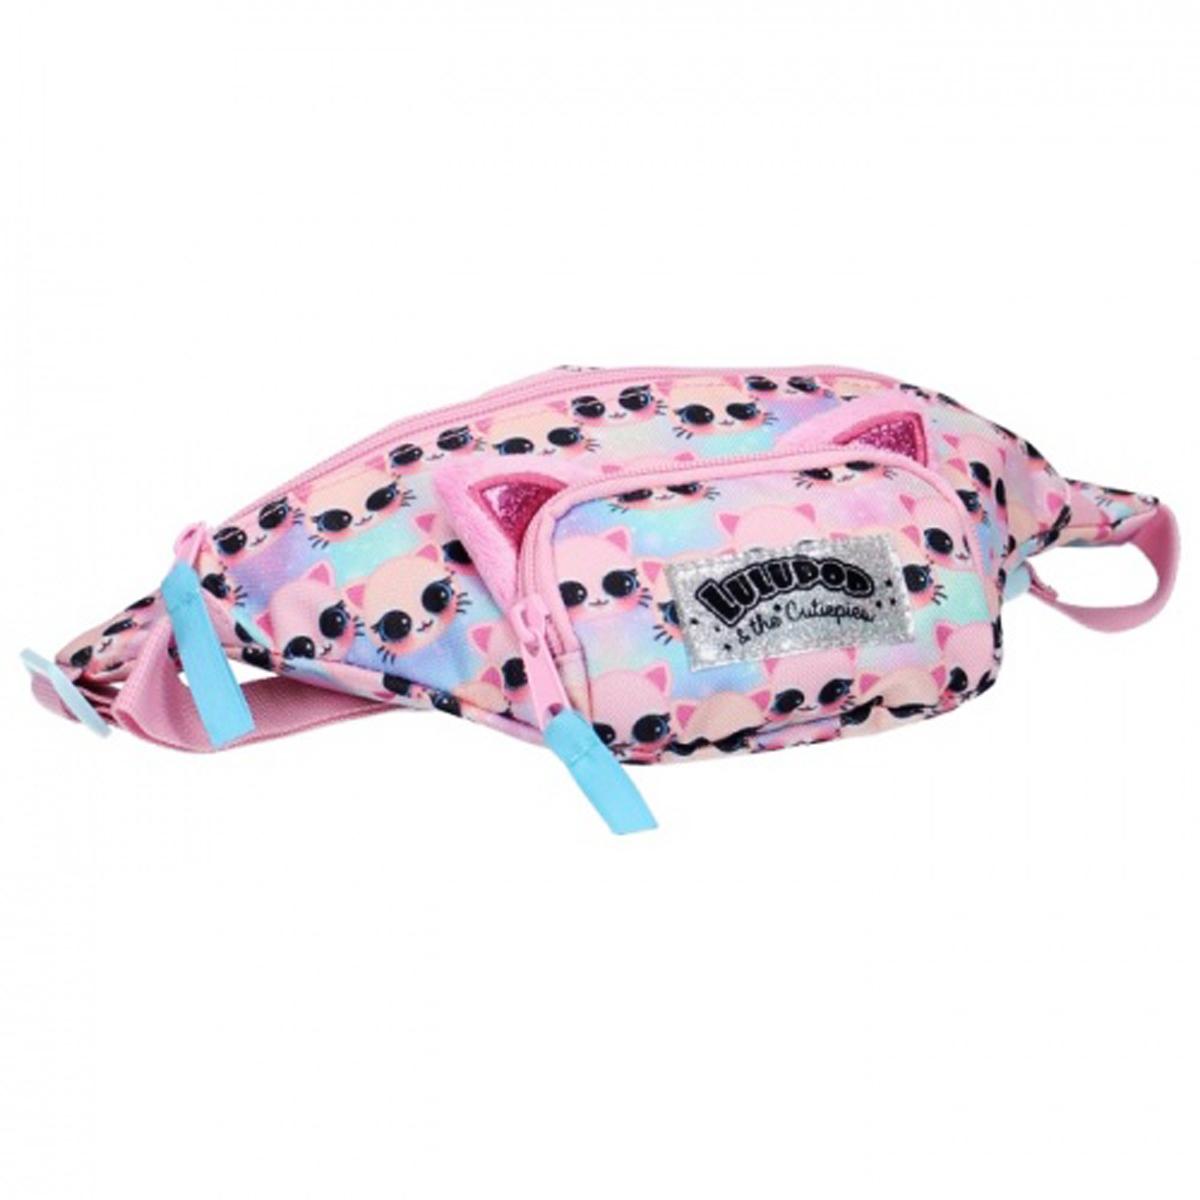 Sac banane / pochette ceinture \'Les Chats\' rose (Lulupop & the Cutiepies) - 33x13x7 cm - [Q7449]